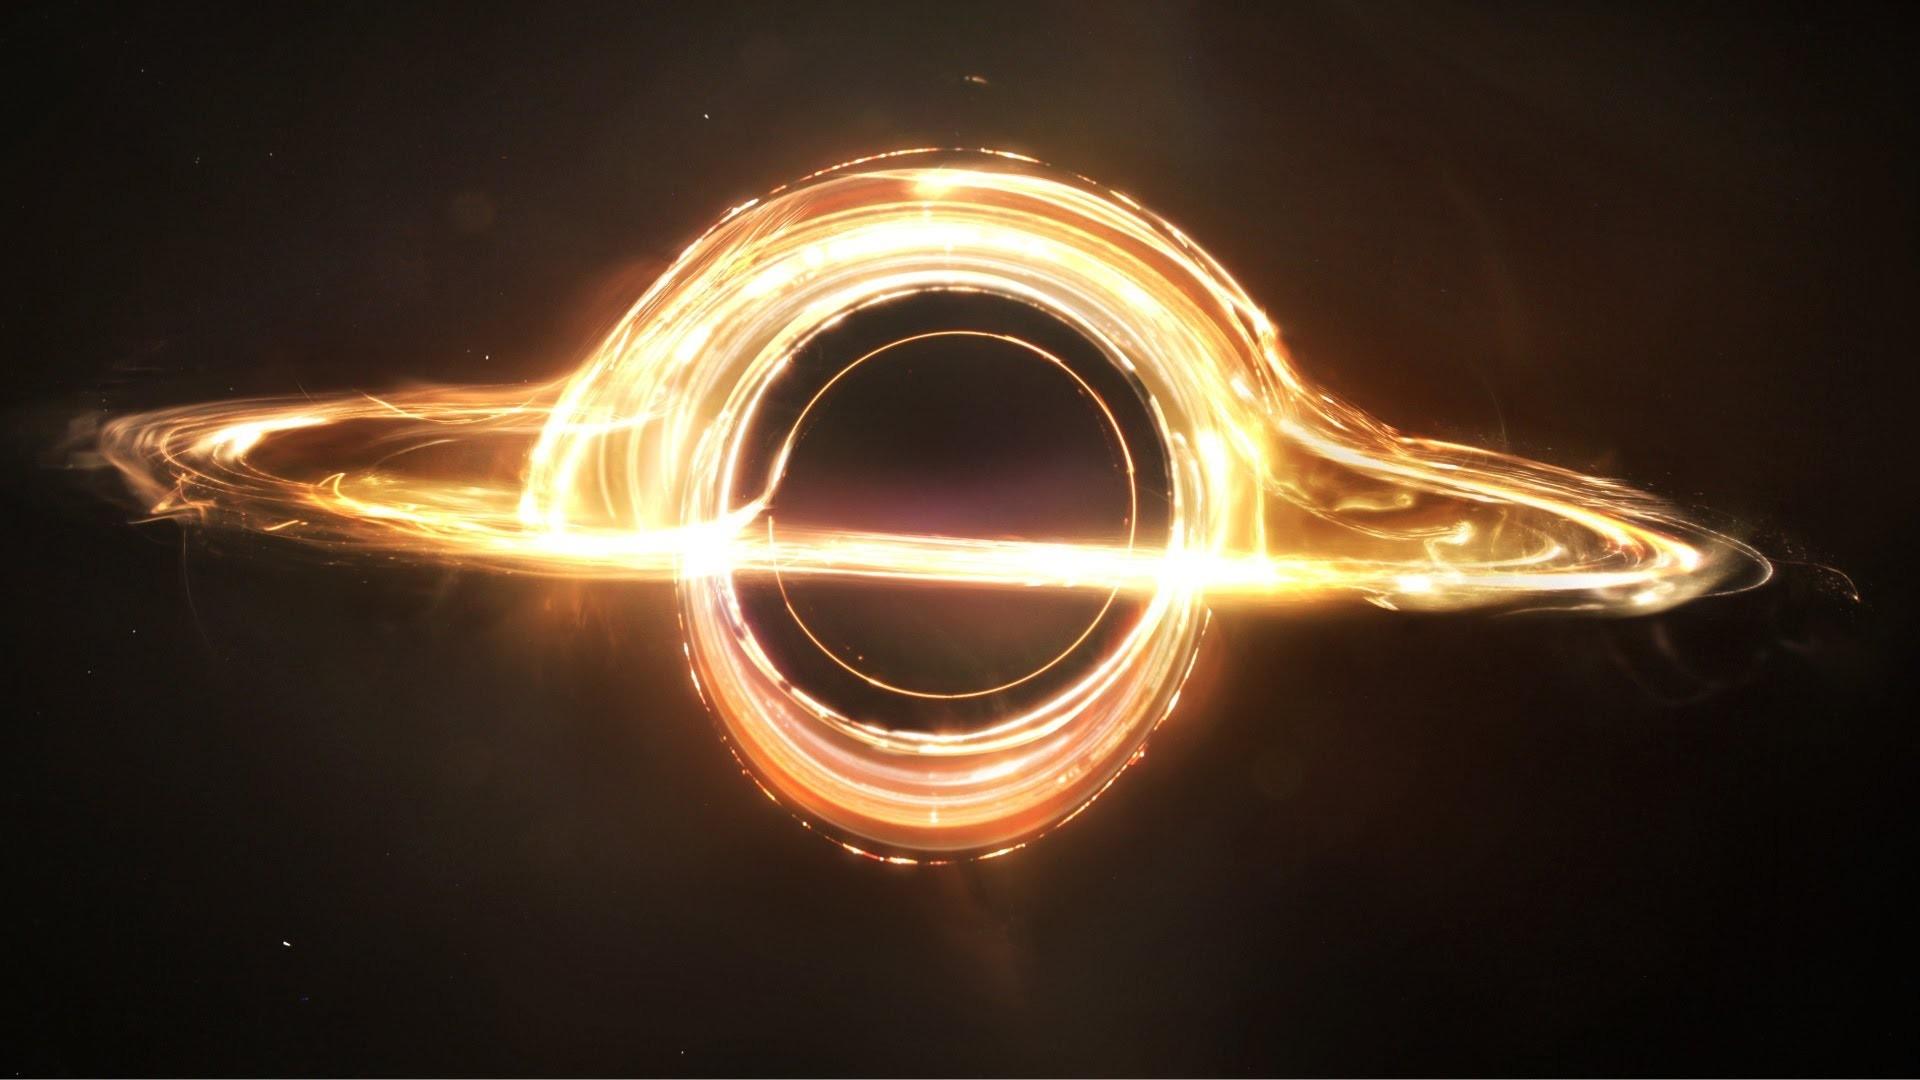 Gallery of Interstellar Gargantua 1080p